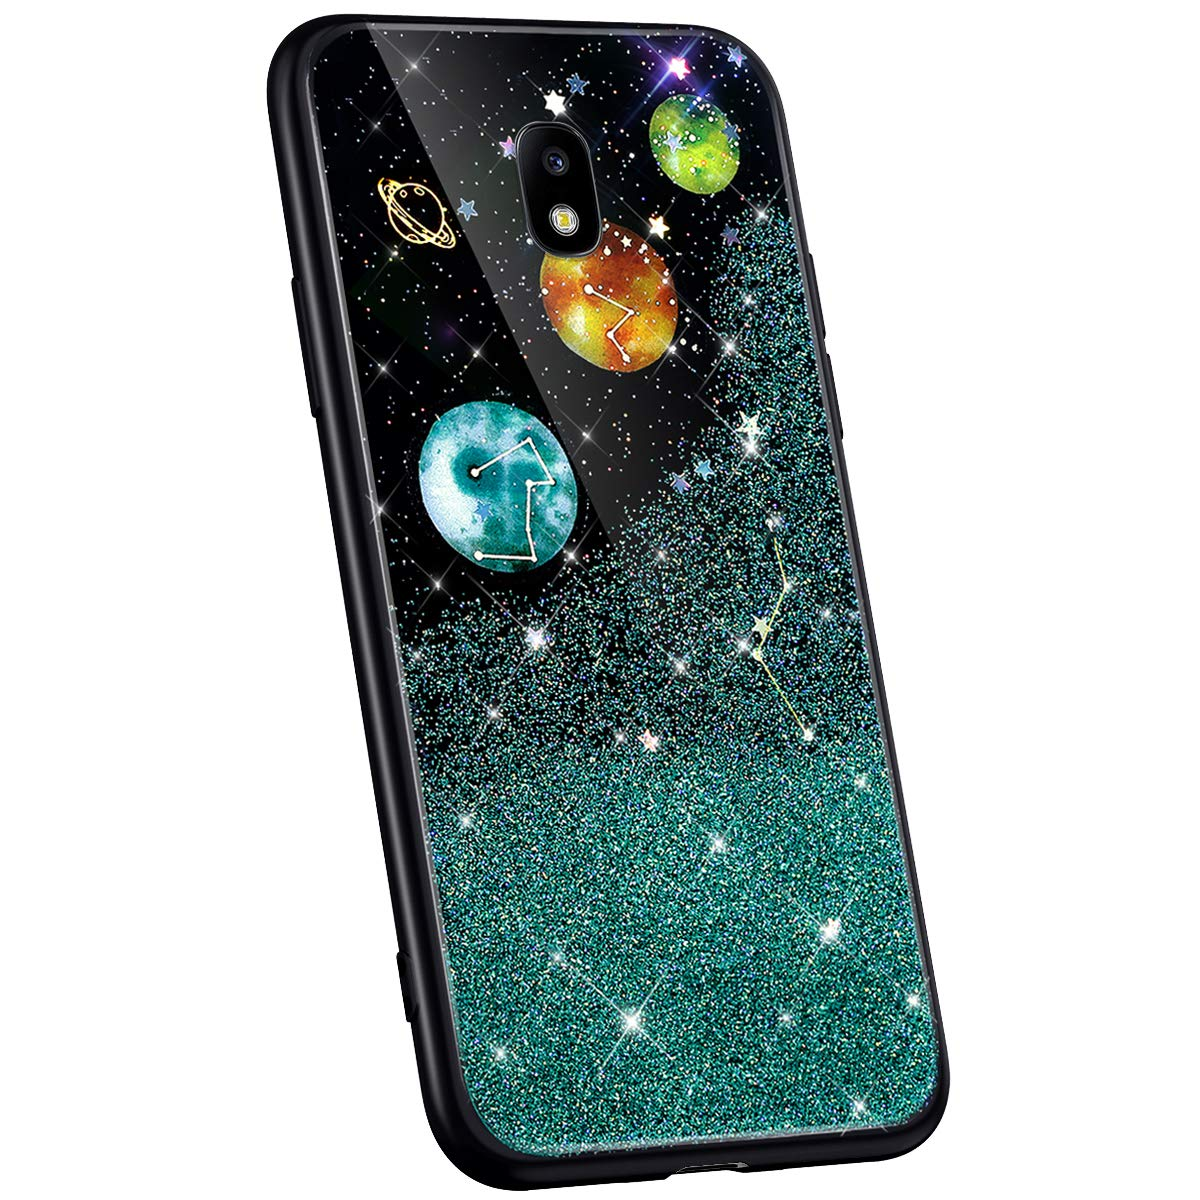 Jinghuash Kompatibel mit Samsung Galaxy J7 2017 H/ülle Case Premium Silikon TPU Kreatives 3D Universum Muster Gl/änzend Glitzer Ultra d/ünn Silikon Kratzfest Handyh/ülle Tasche Case,Silber